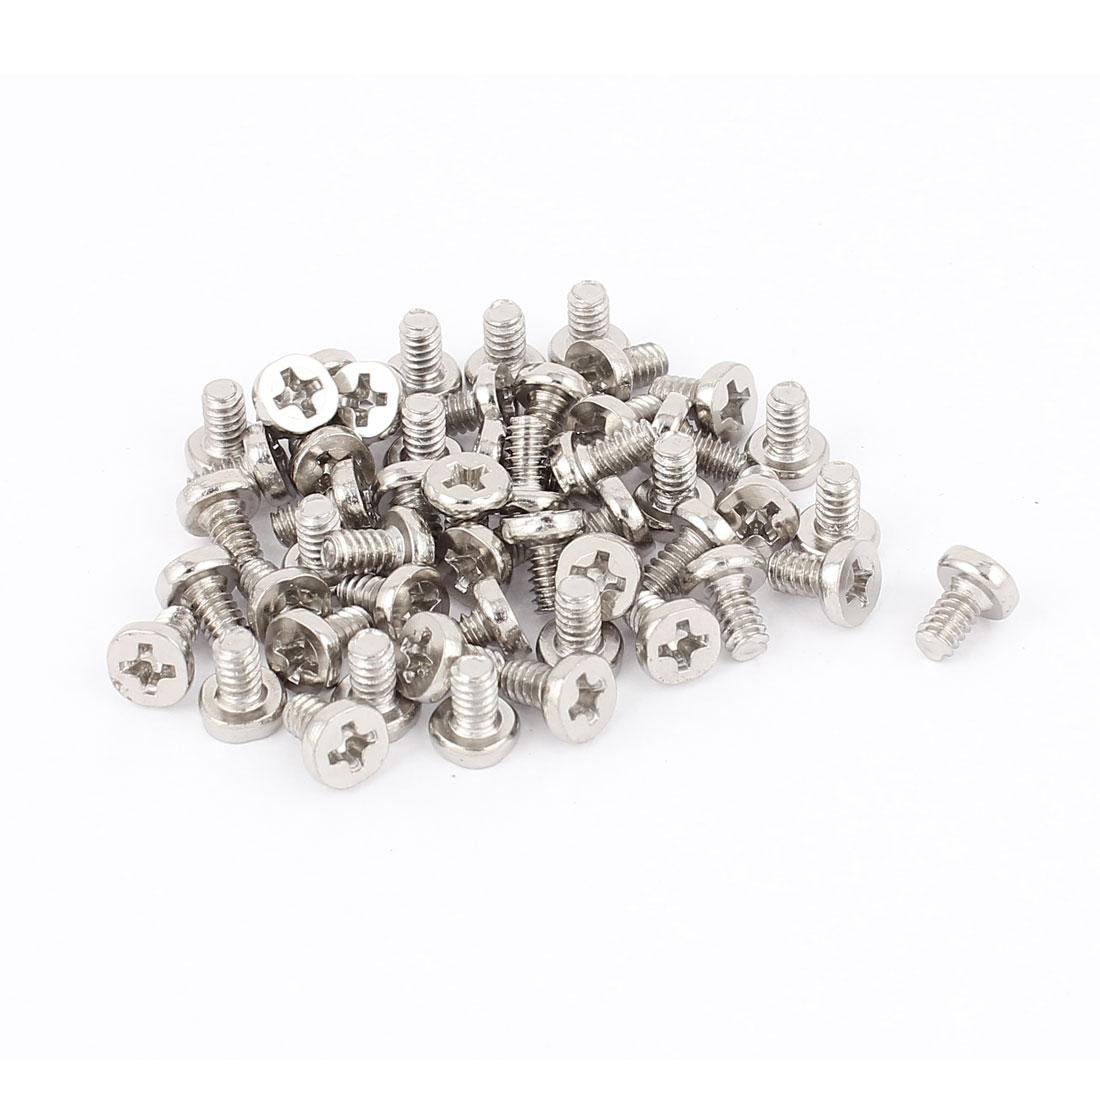 6#-32x6 Nickel Plated Countersunk Phillips Flat Head Screws Silver Tone 50Pcs